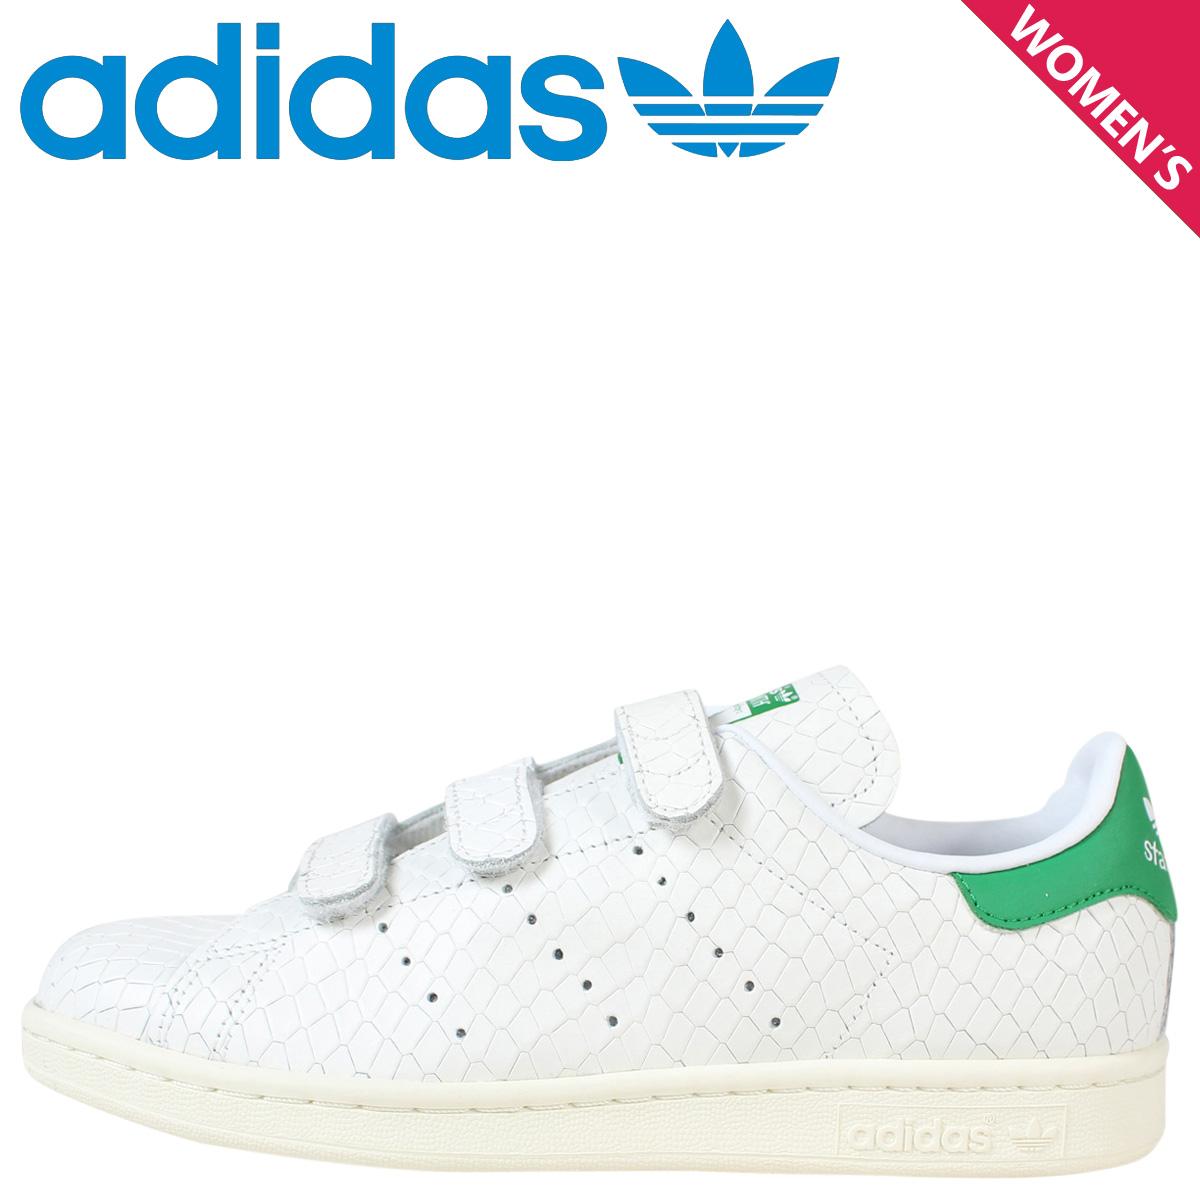 adidas Originals adidas originals Stan Smith sneakers Womens STAN SMITH CF  W S32171 shoes white